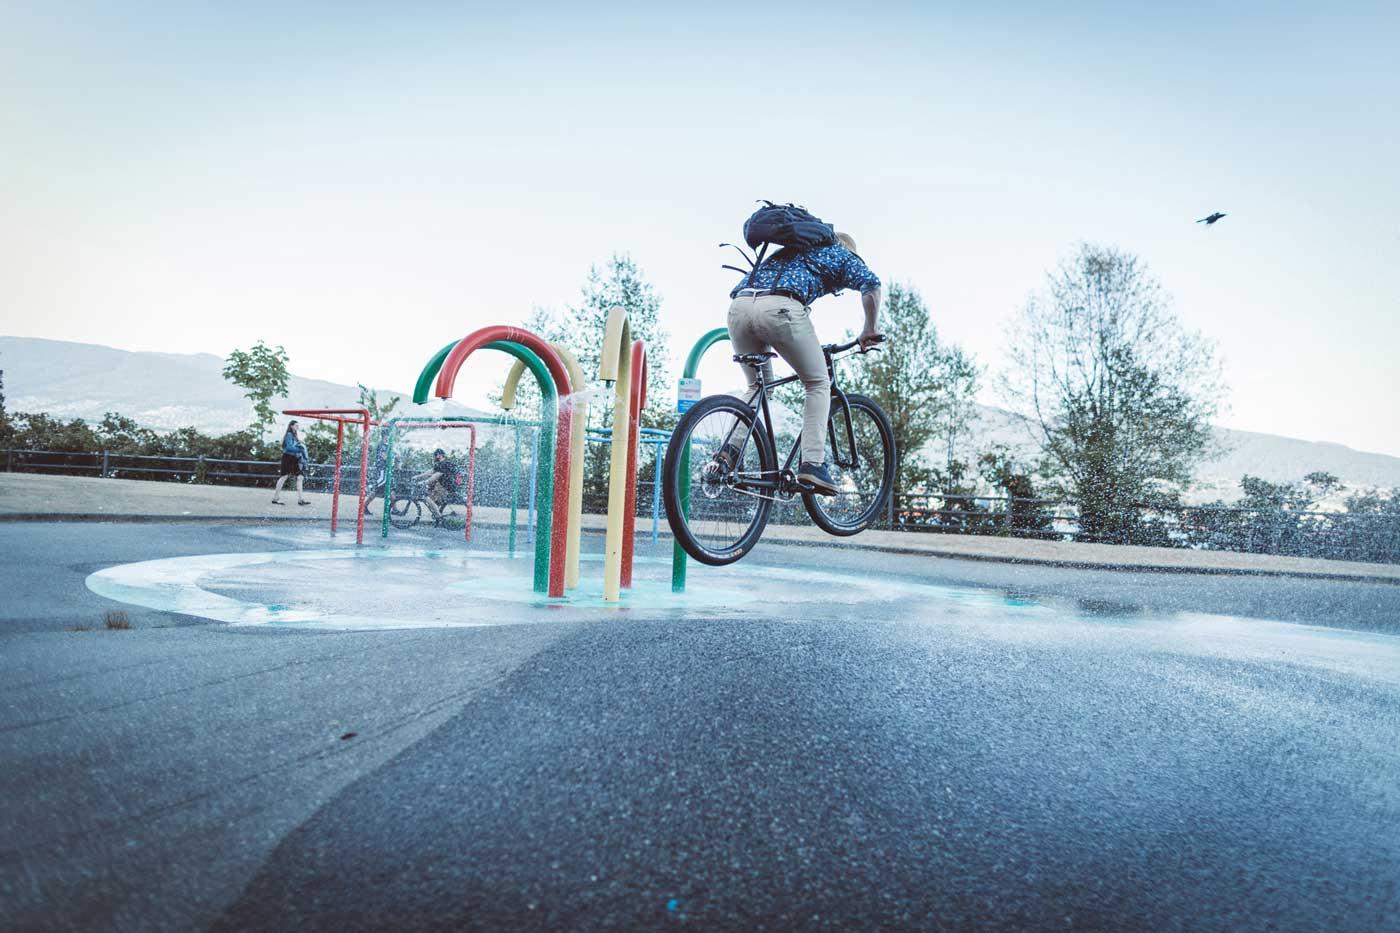 Landyachtz_Frame_Sets_Play_Bikeplay-bike-jump